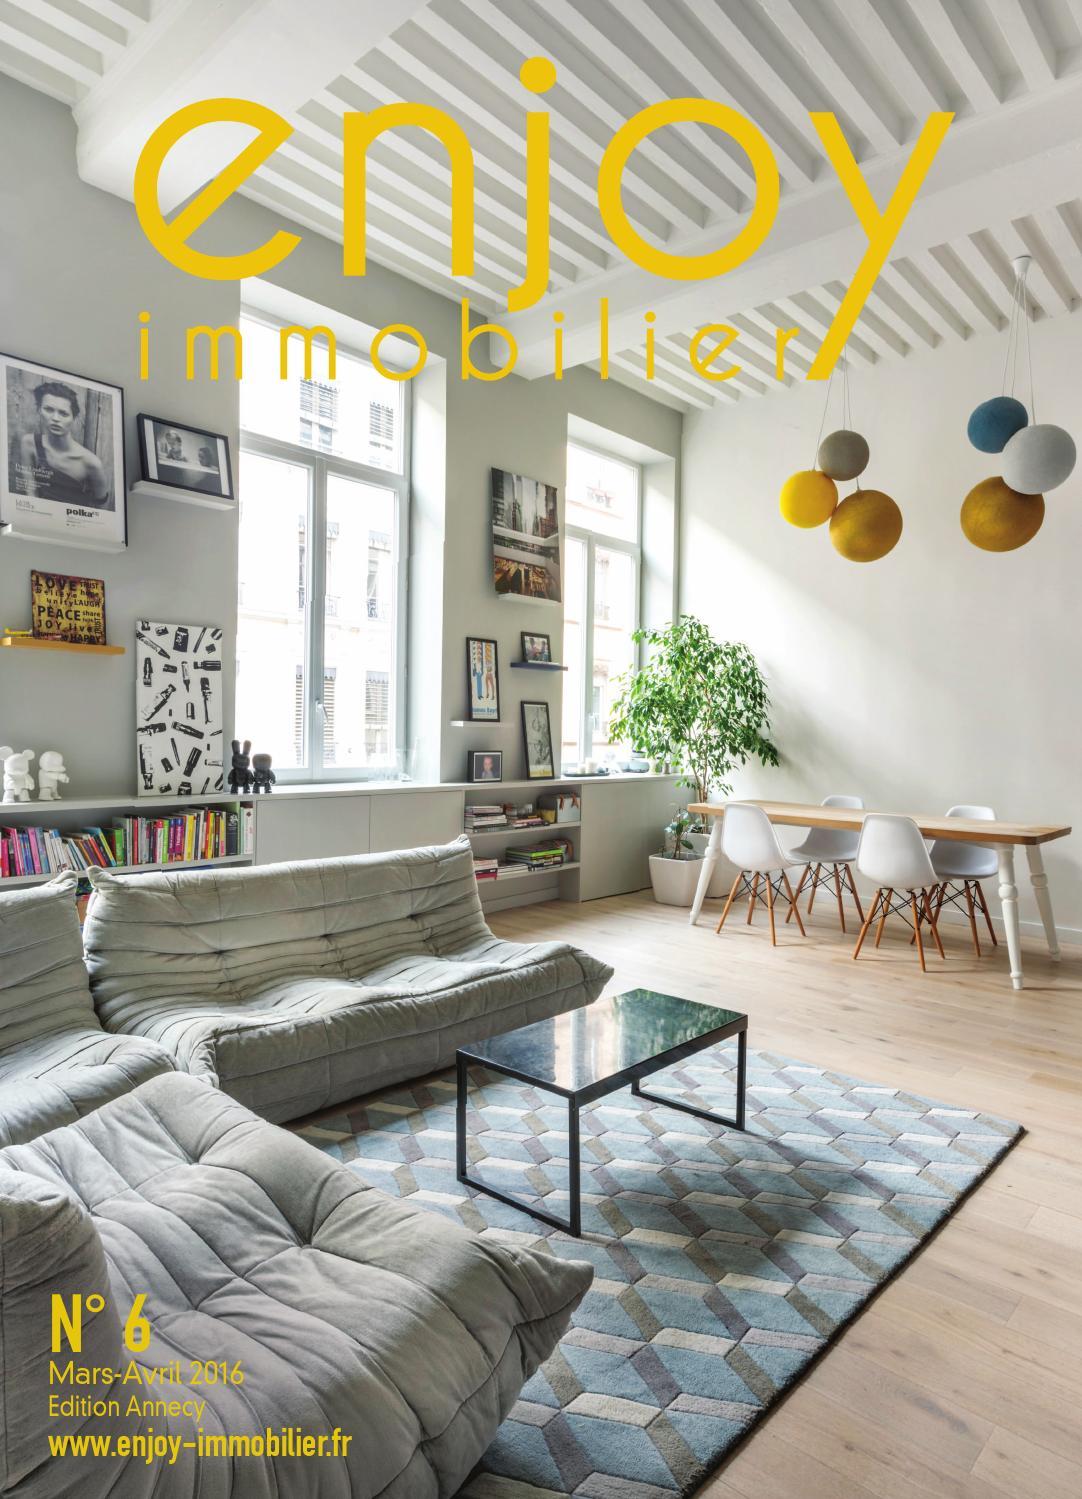 enjoy immobilier annecy n mars avril 2016 by enjoy media issuu. Black Bedroom Furniture Sets. Home Design Ideas